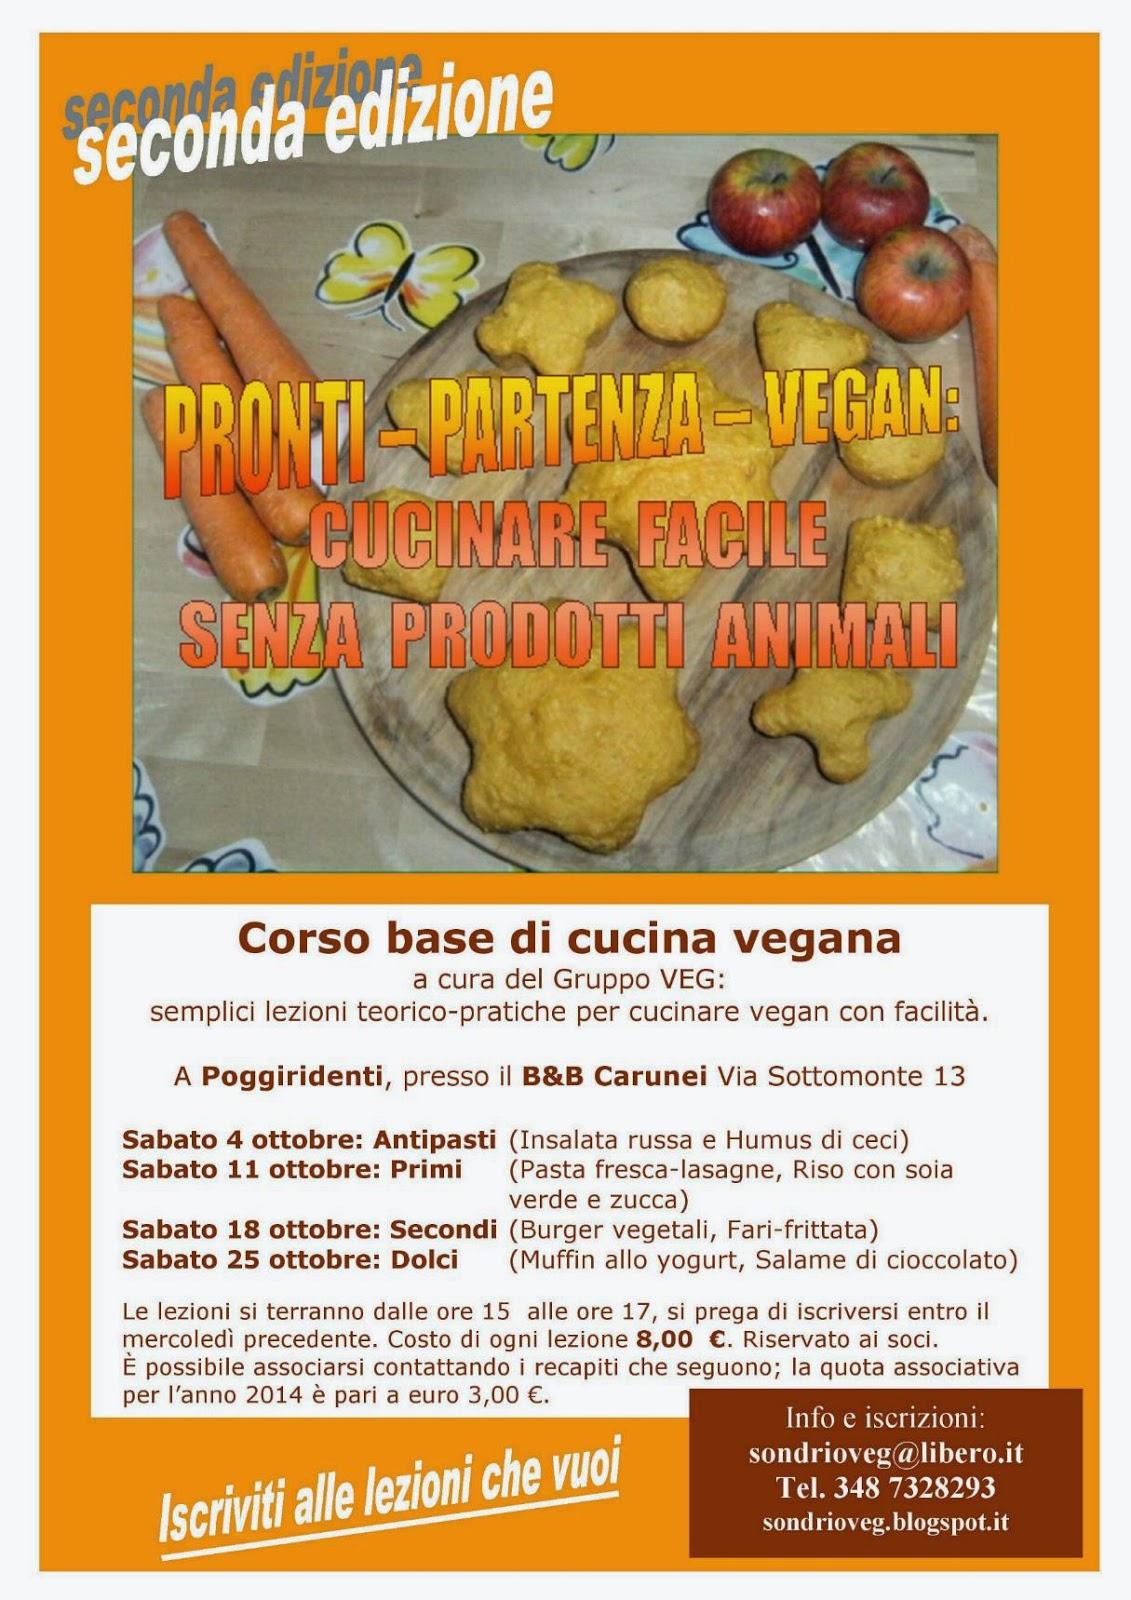 Gruppo veg vegani e vegetariani valtellina valchiavenna e altolario corso base di cucina vegana - Corso base di cucina ...